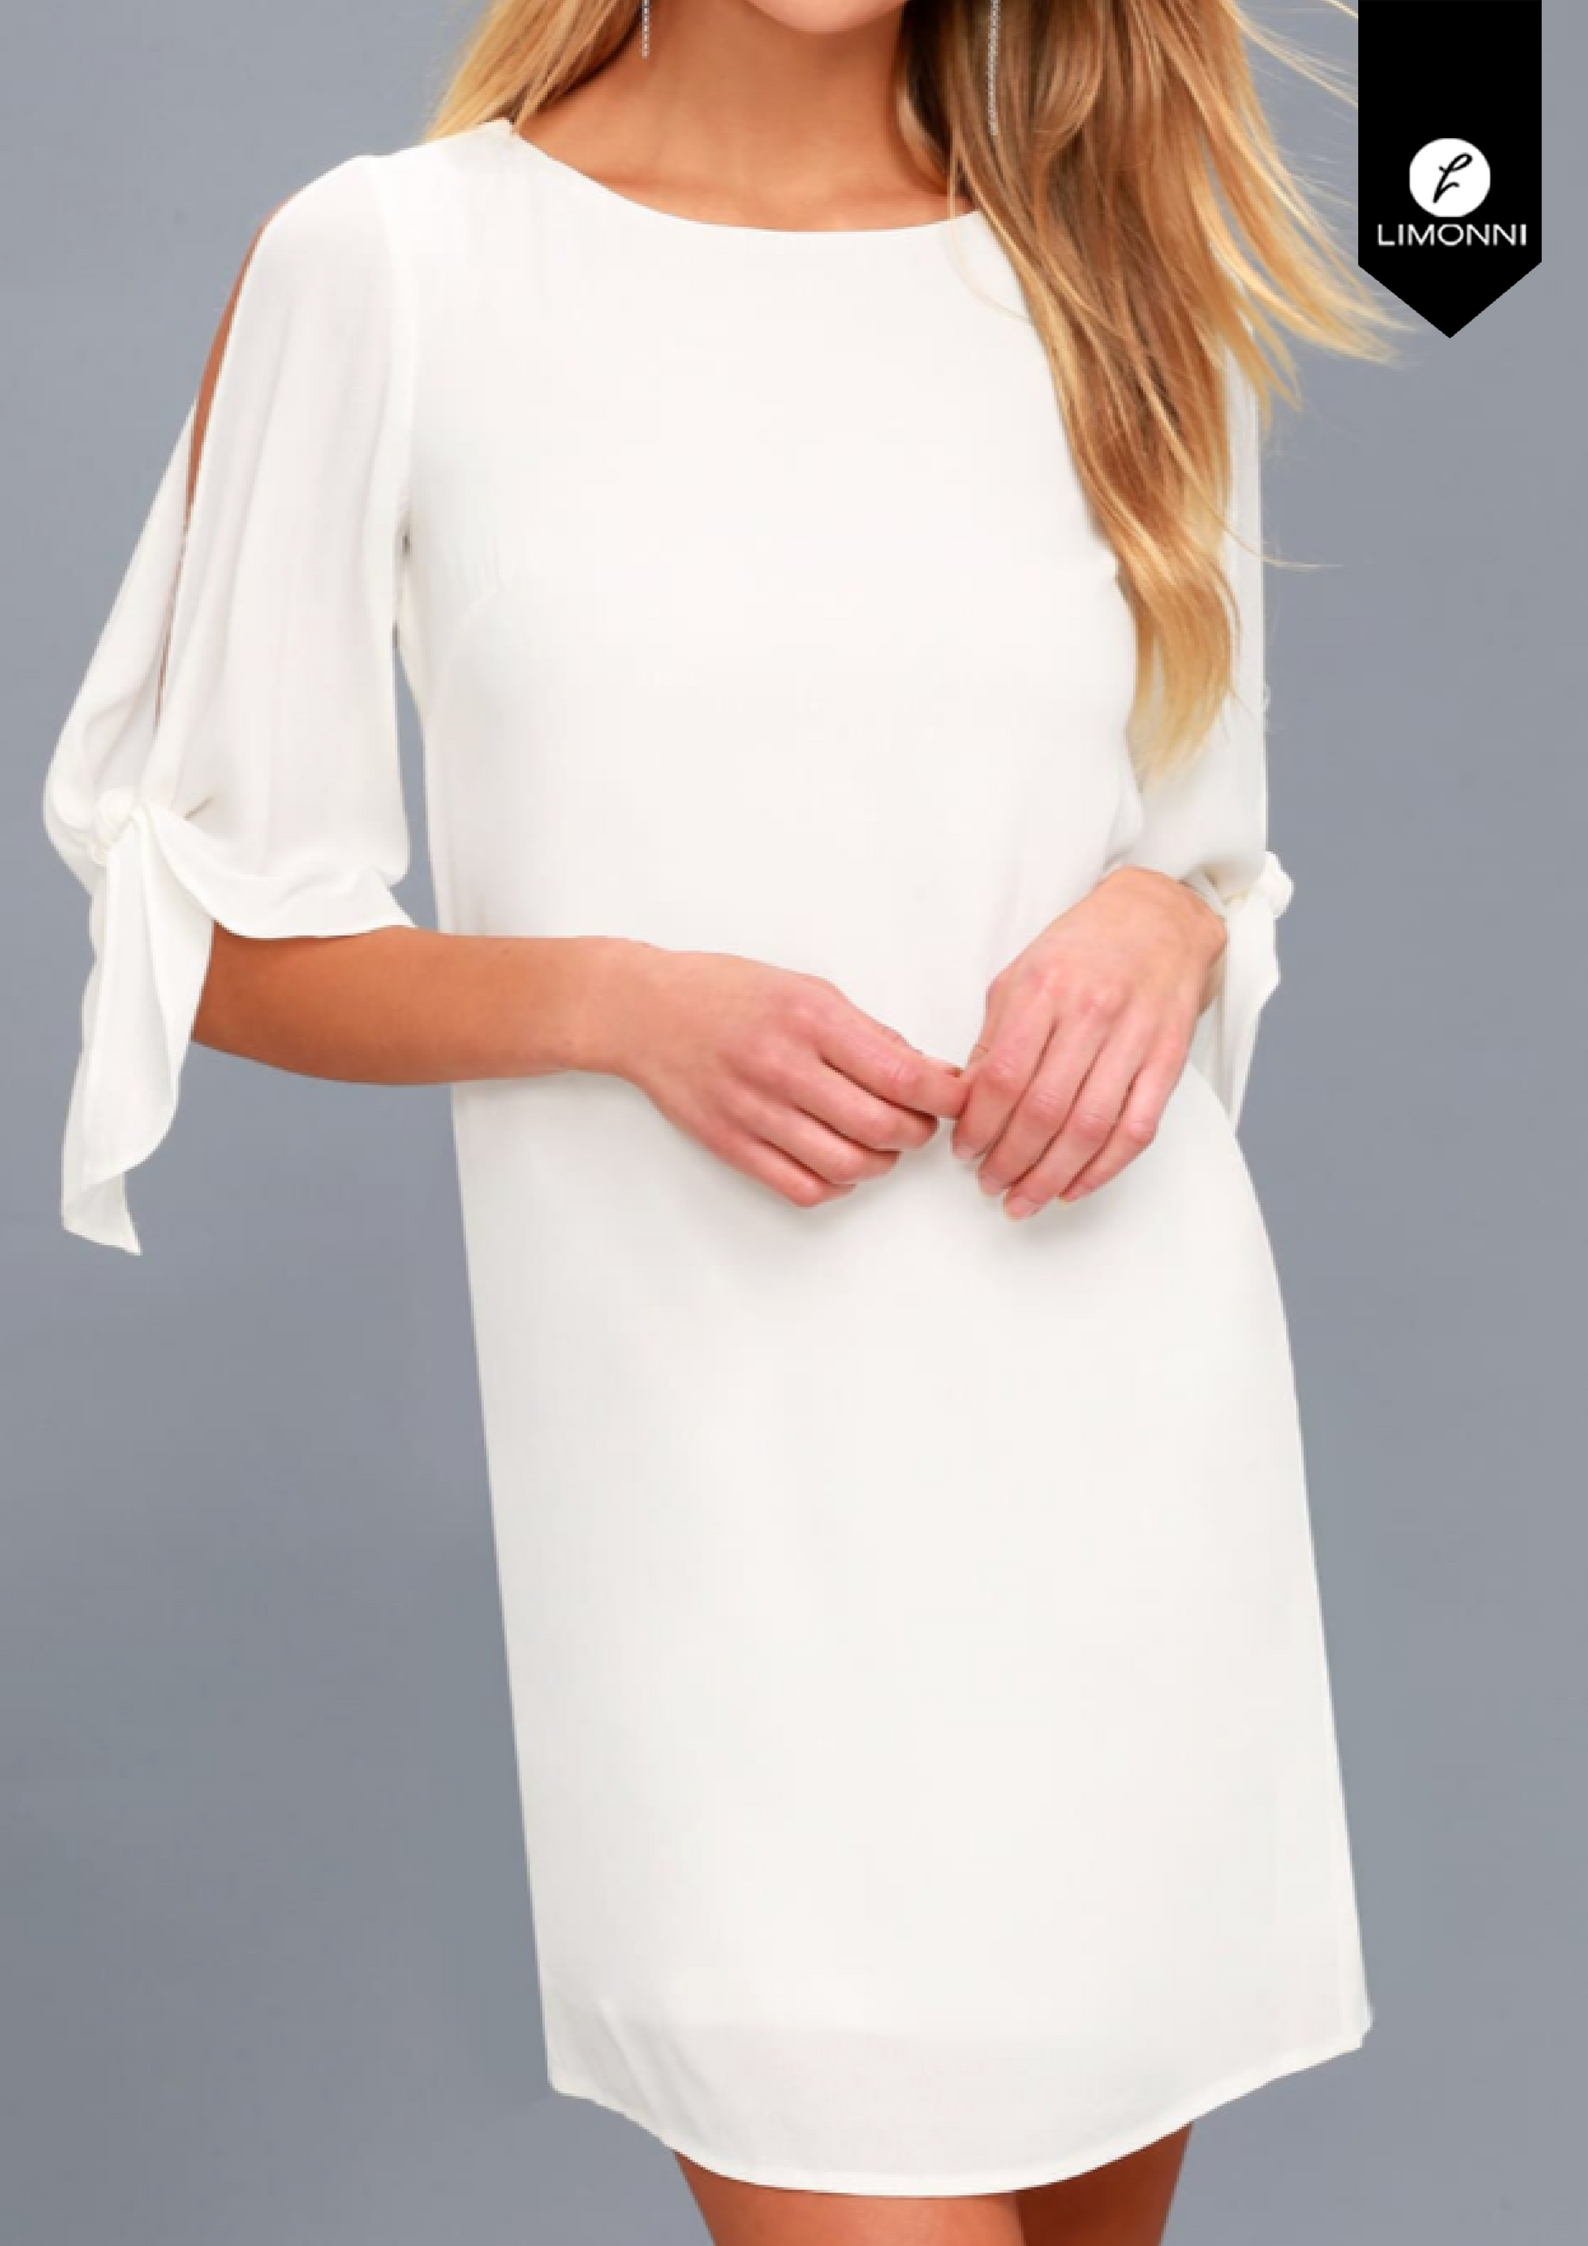 Vestidos para mujer Limonni Novalee LI1463 Cortos elegantes